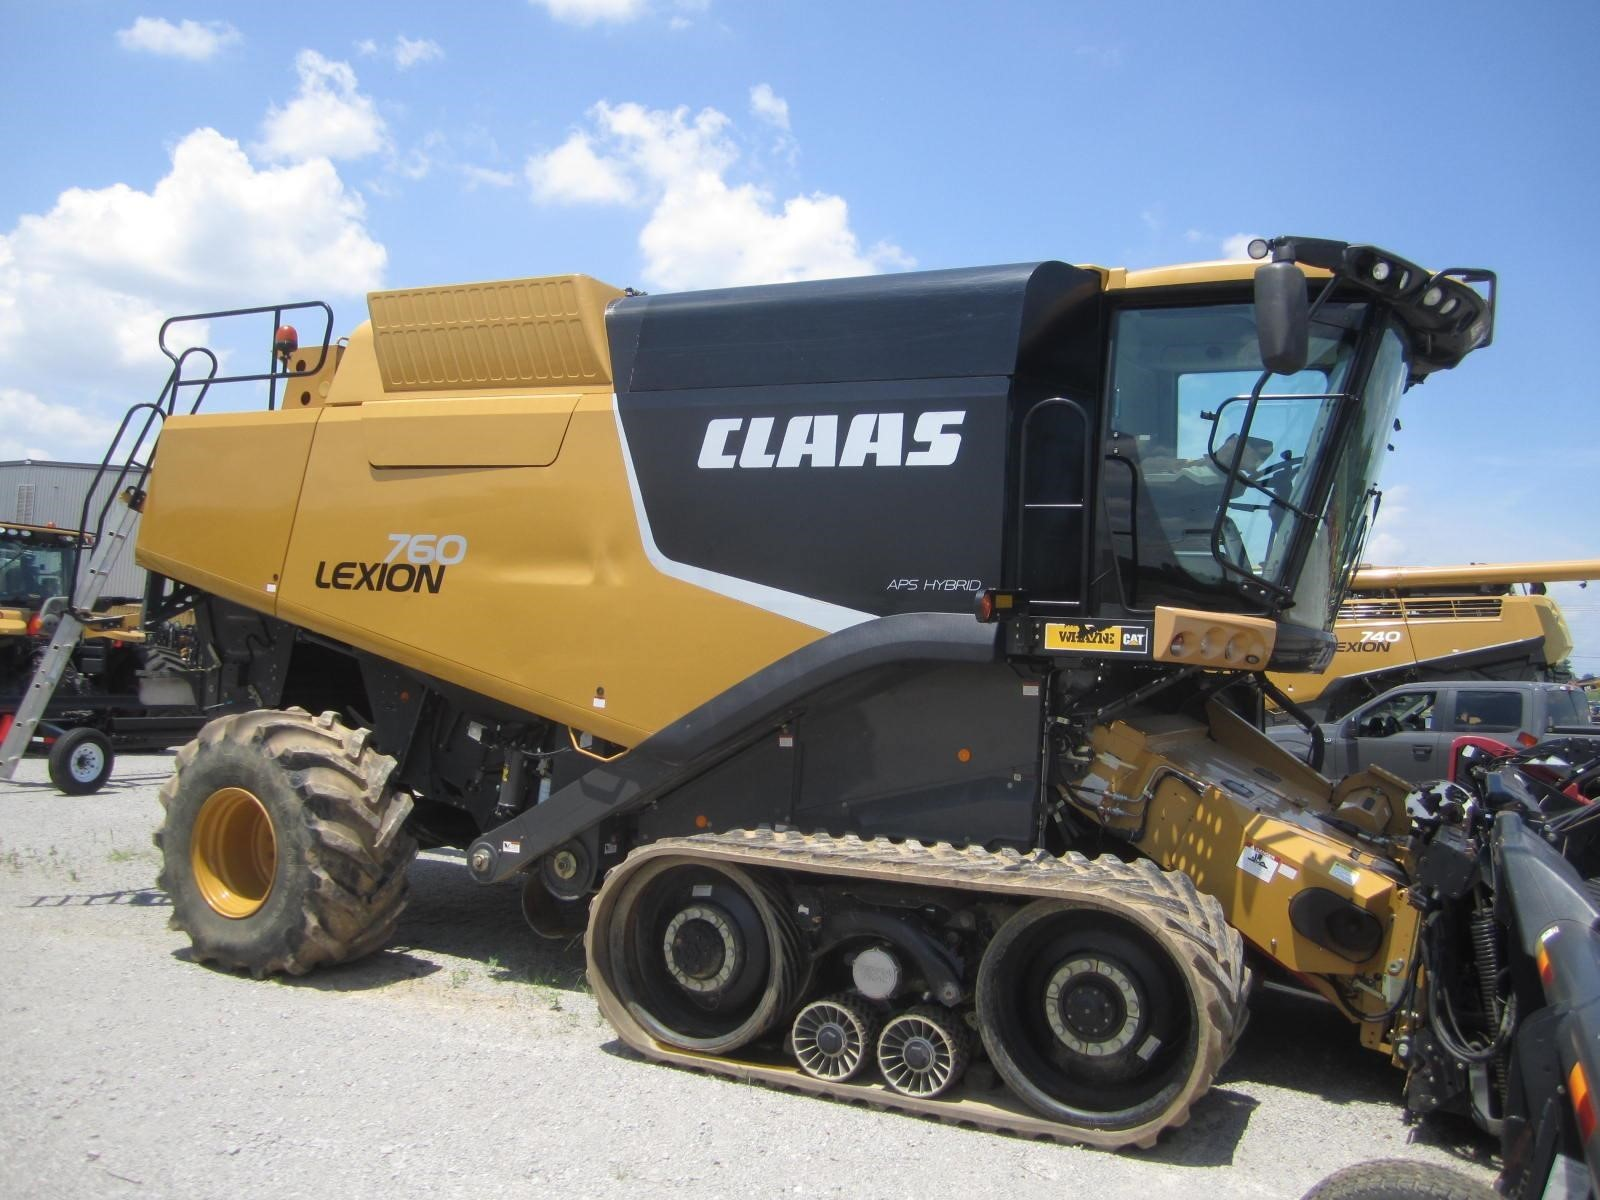 2013 Claas Lexion 760TT Combine